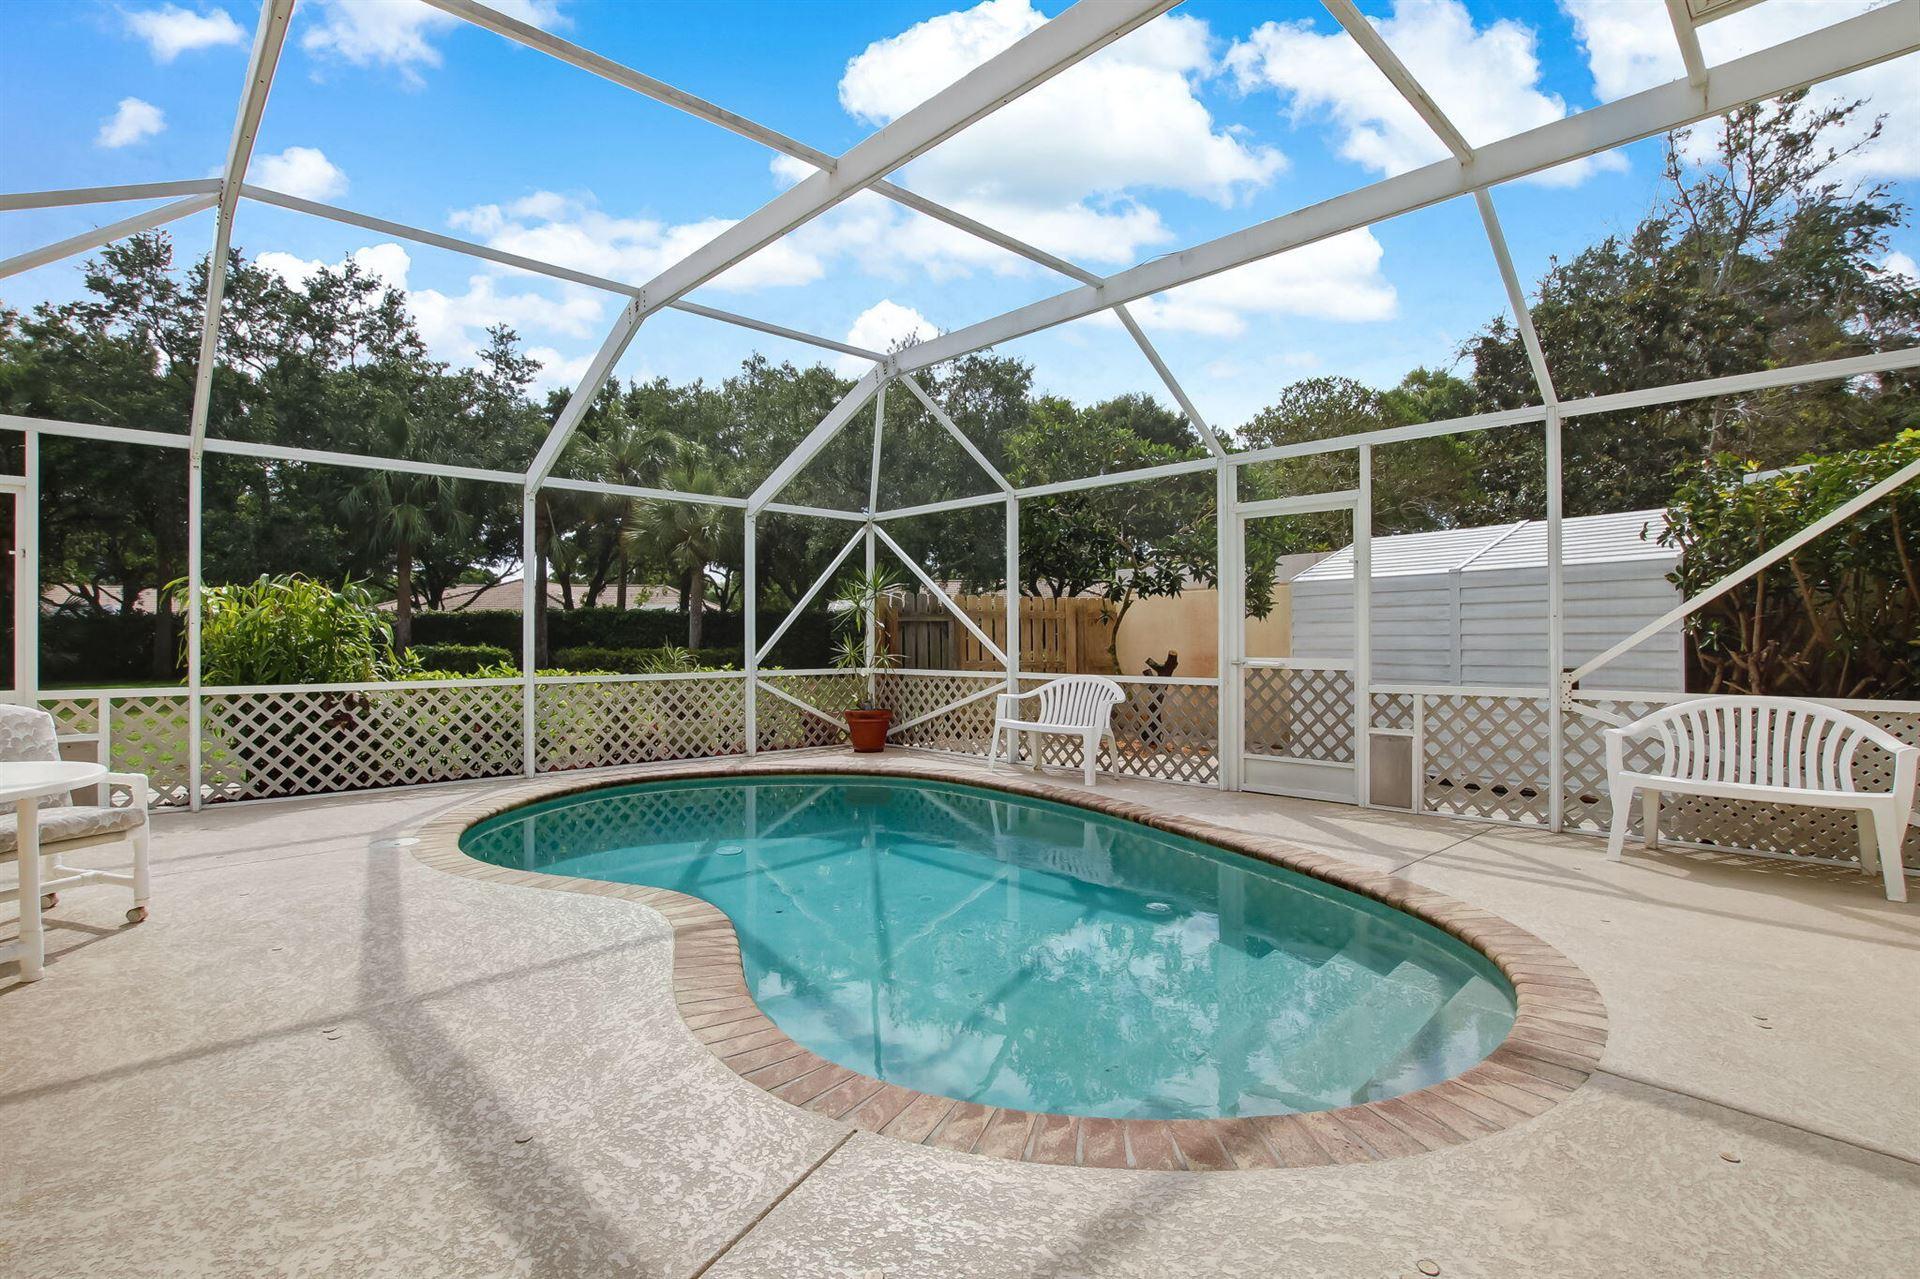 Photo of 464 Capistrano Drive, Palm Beach Gardens, FL 33410 (MLS # RX-10716090)